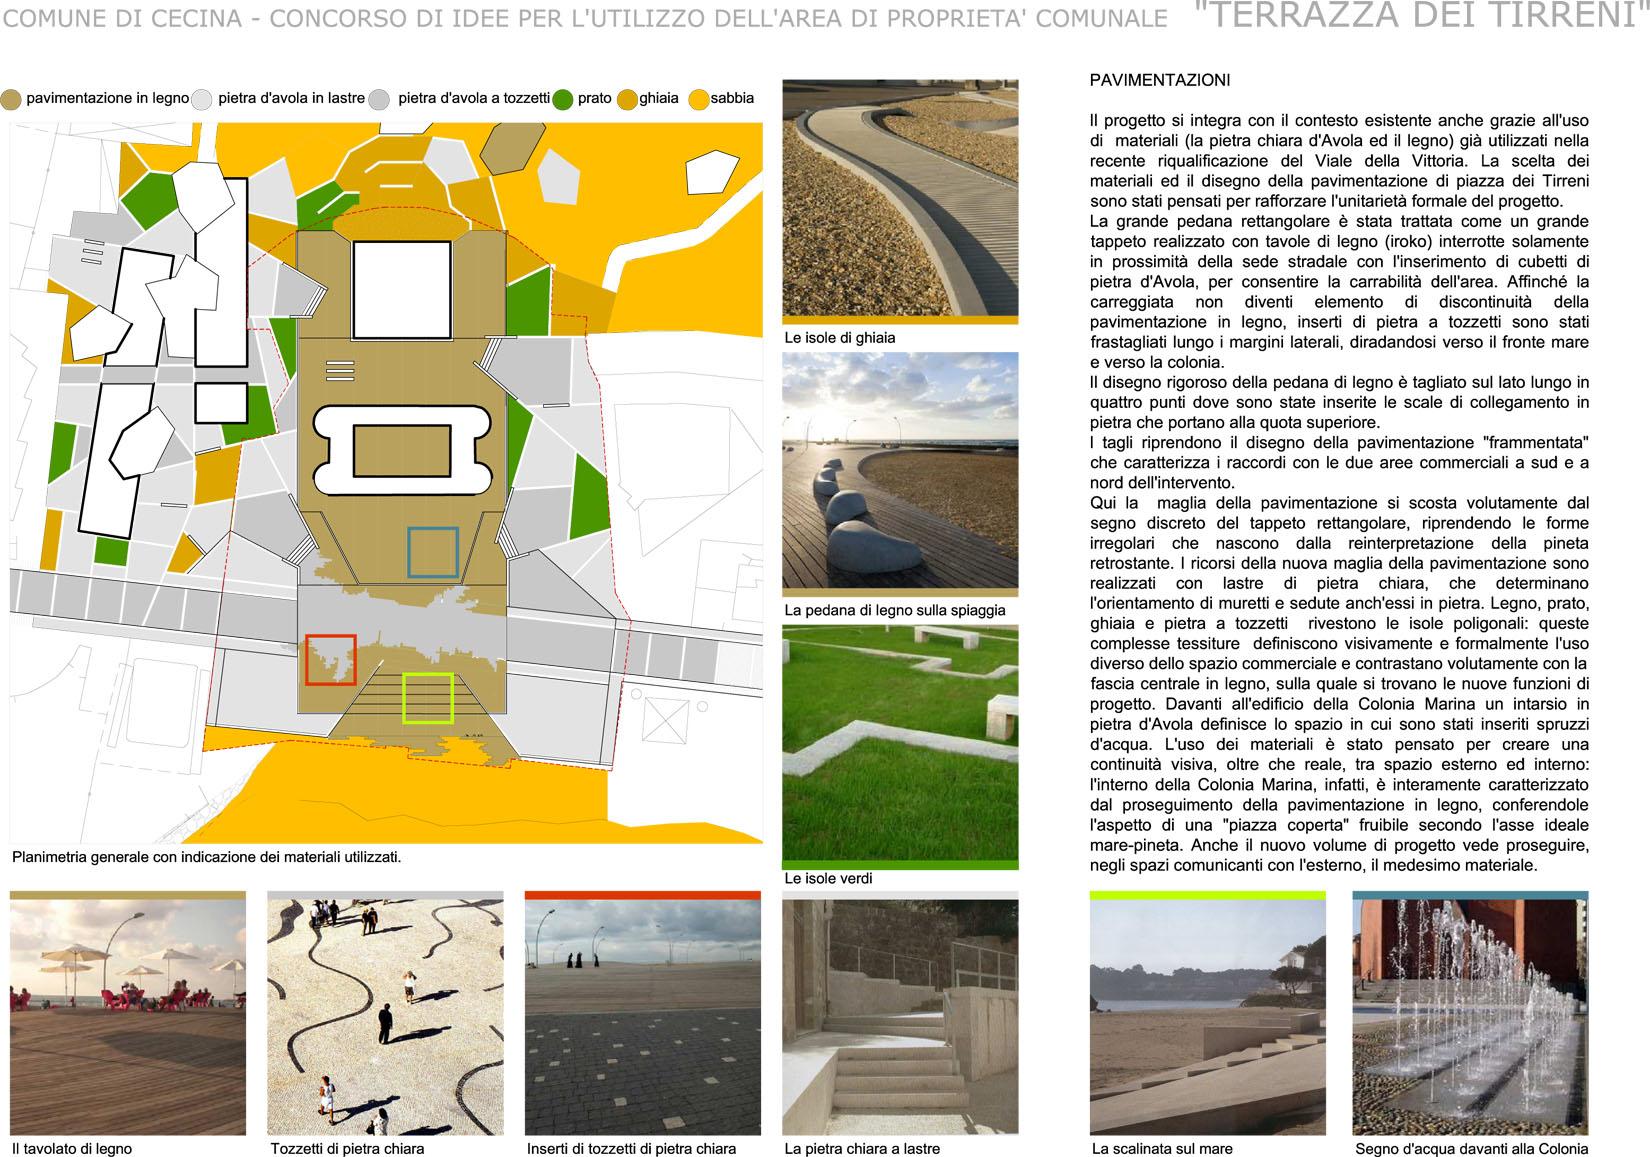 Z:SERVER_CIROPOS_ALFA11concorso_idee_terrazzaCONSEGNArelazi